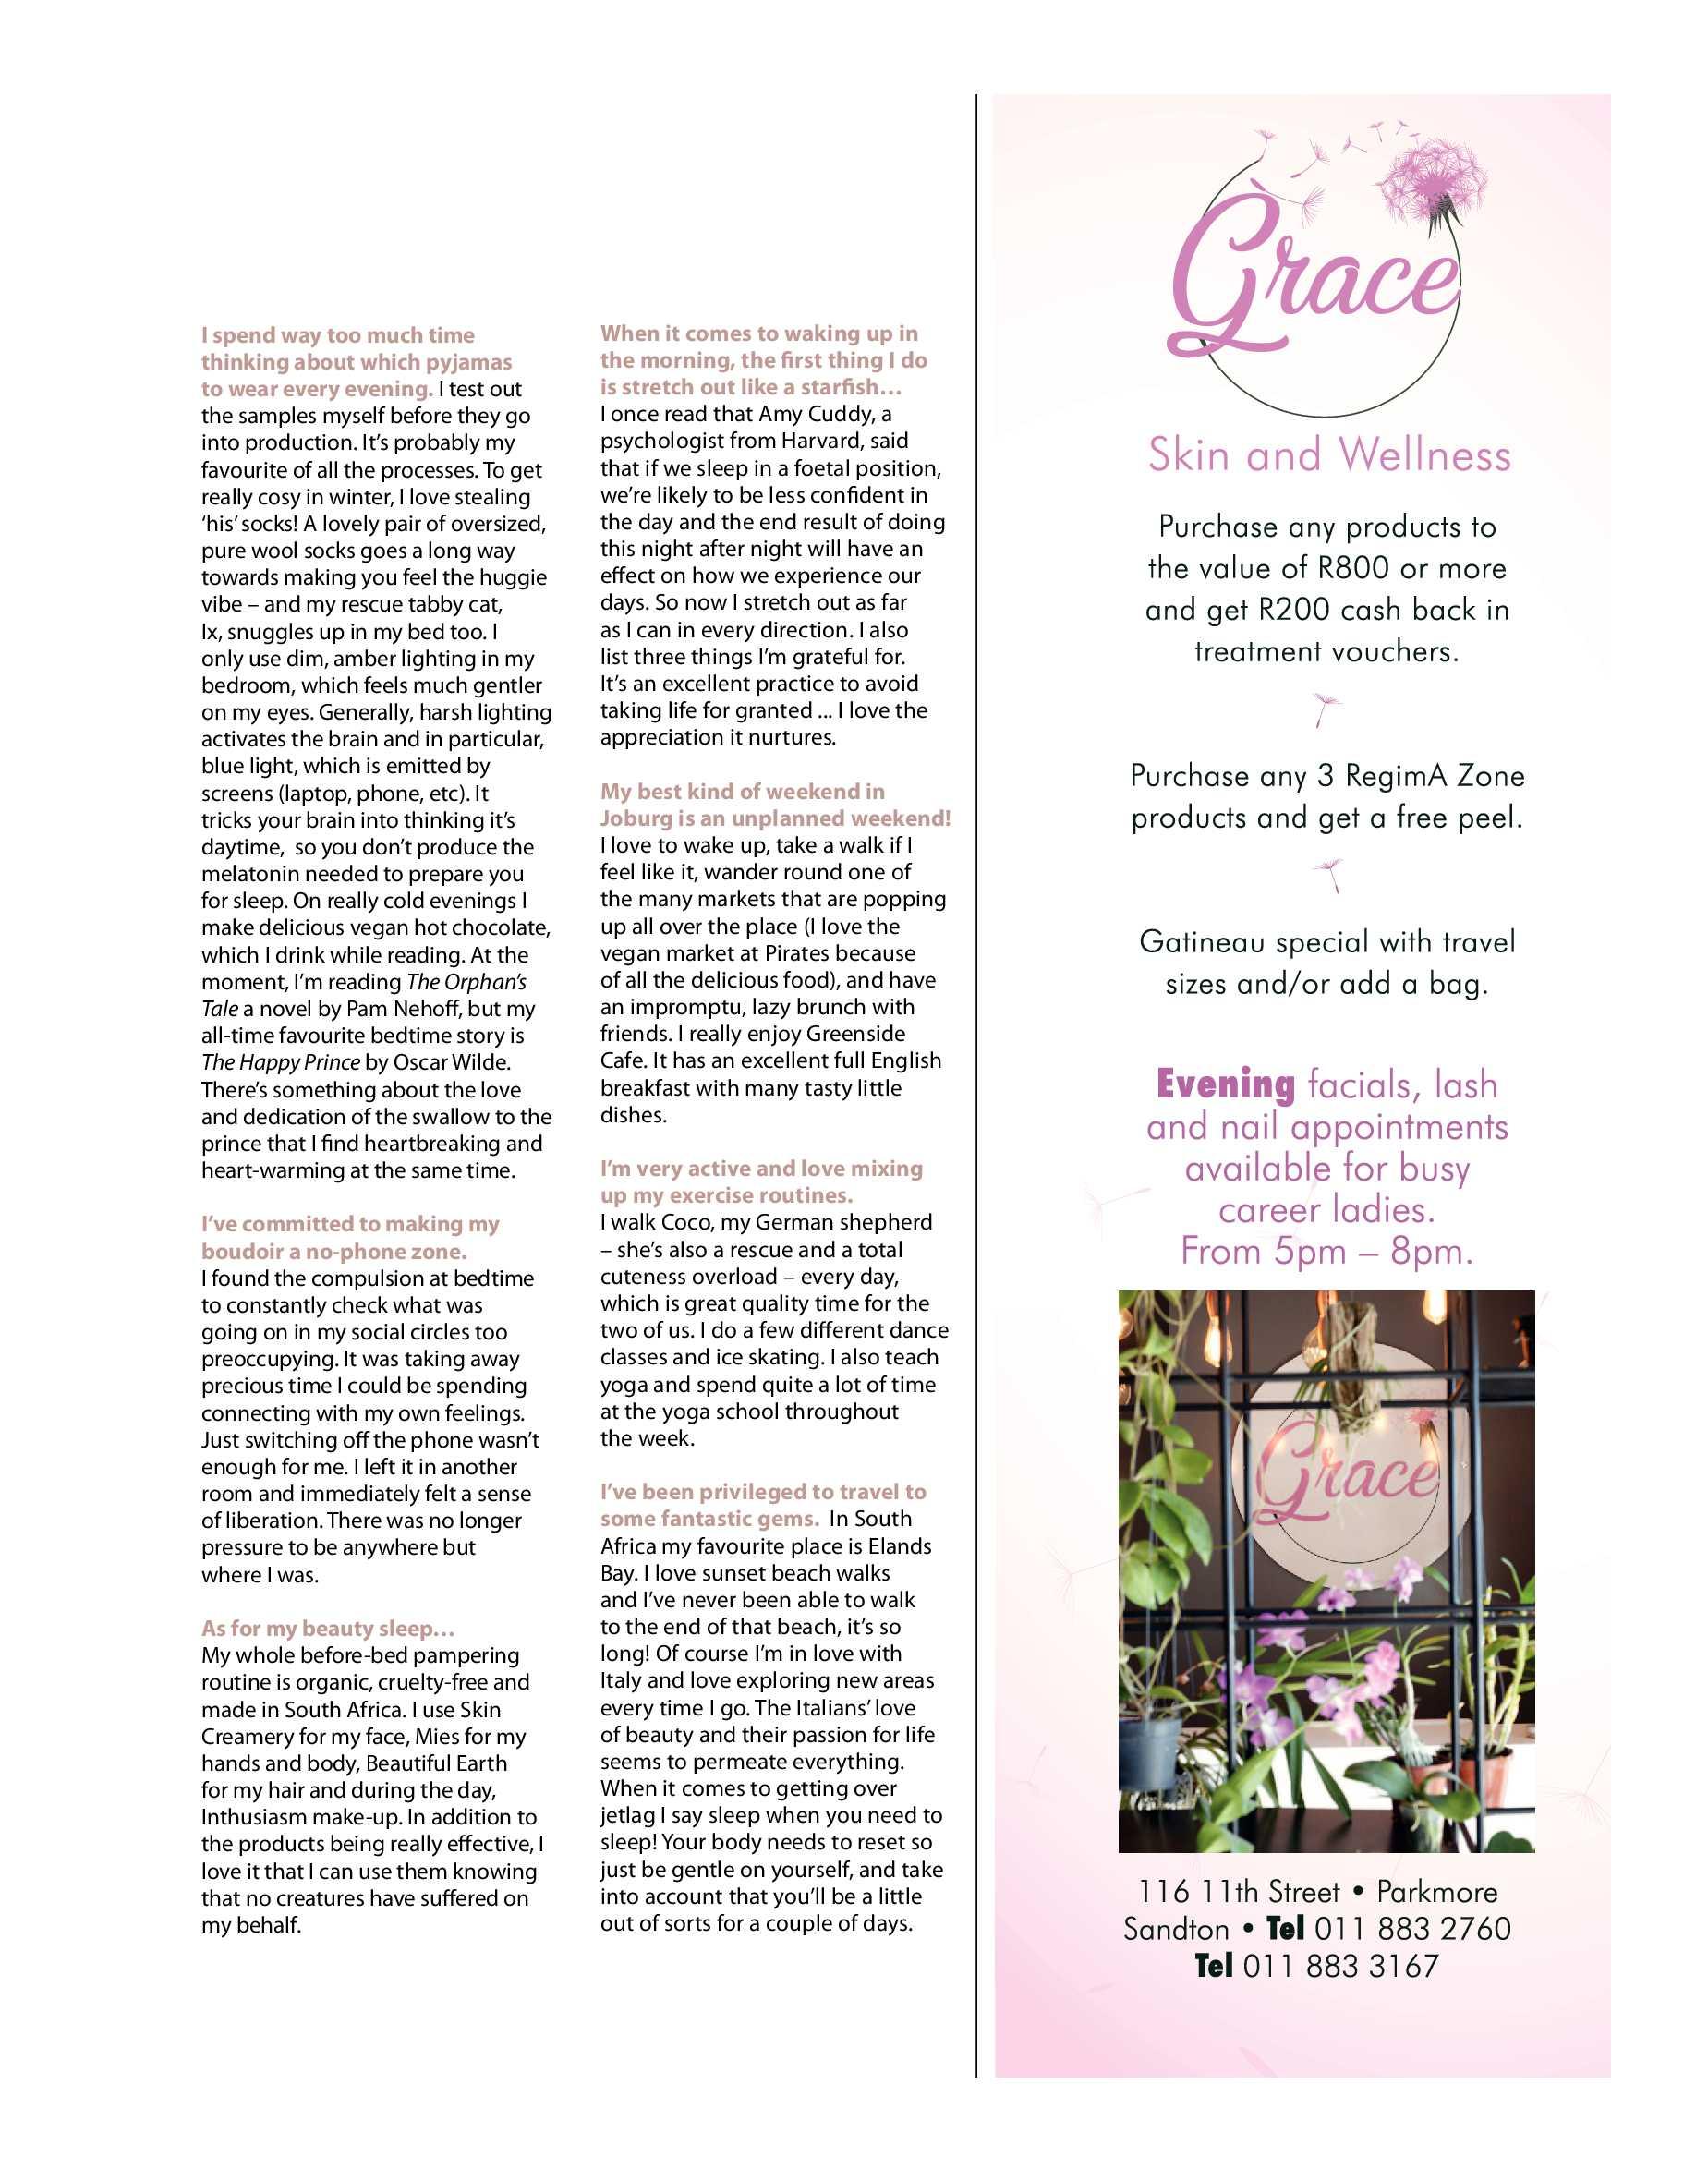 get-joburg-north-july-2017-epapers-page-23